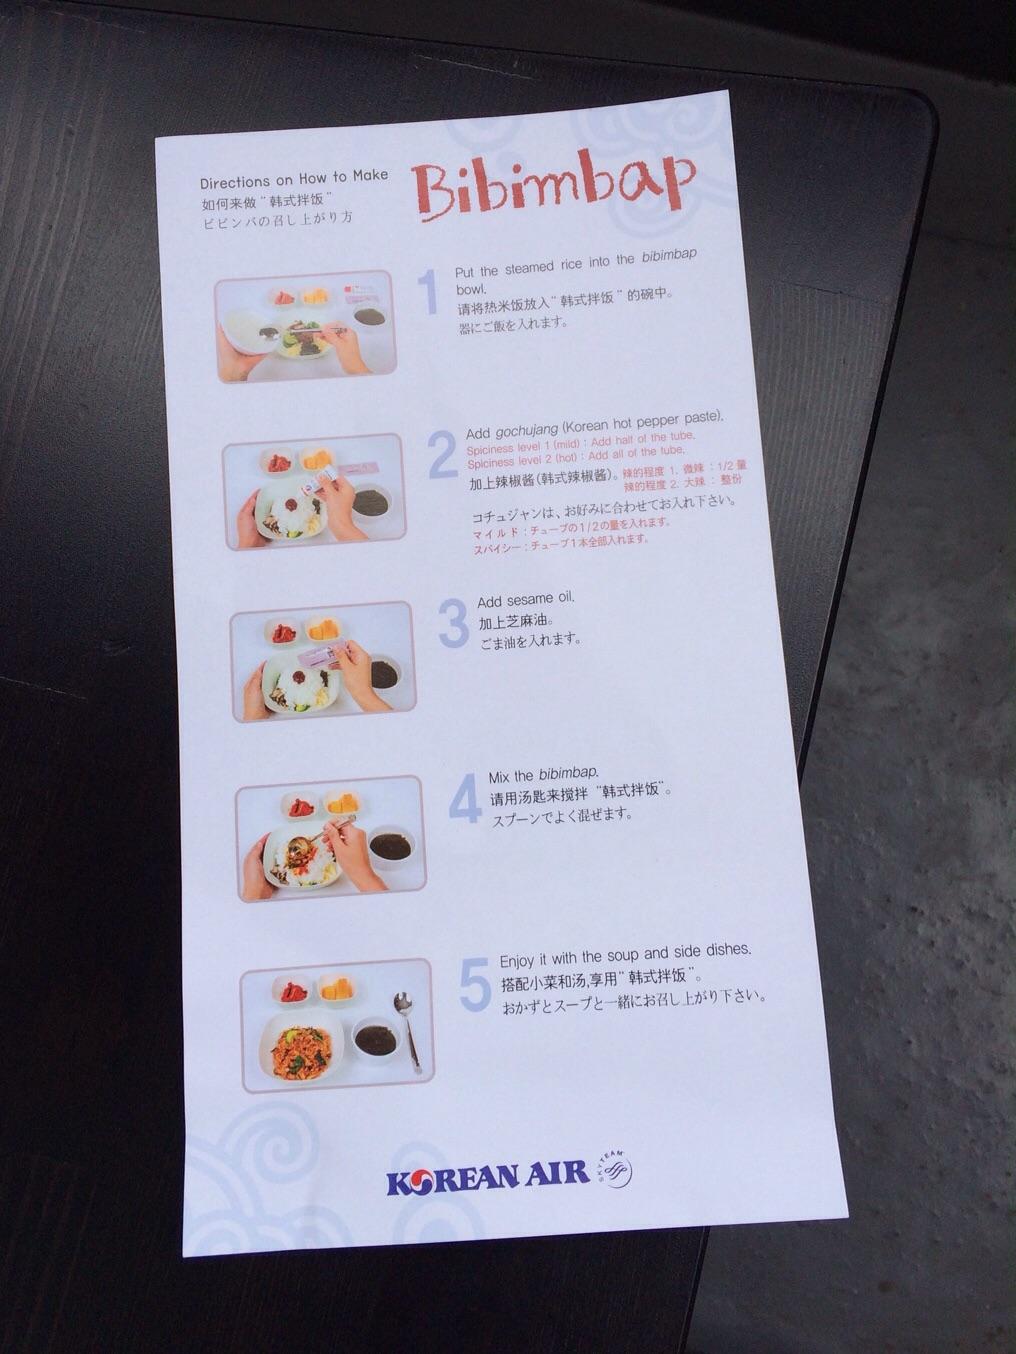 Bibimbap instructions for the uninitiated.